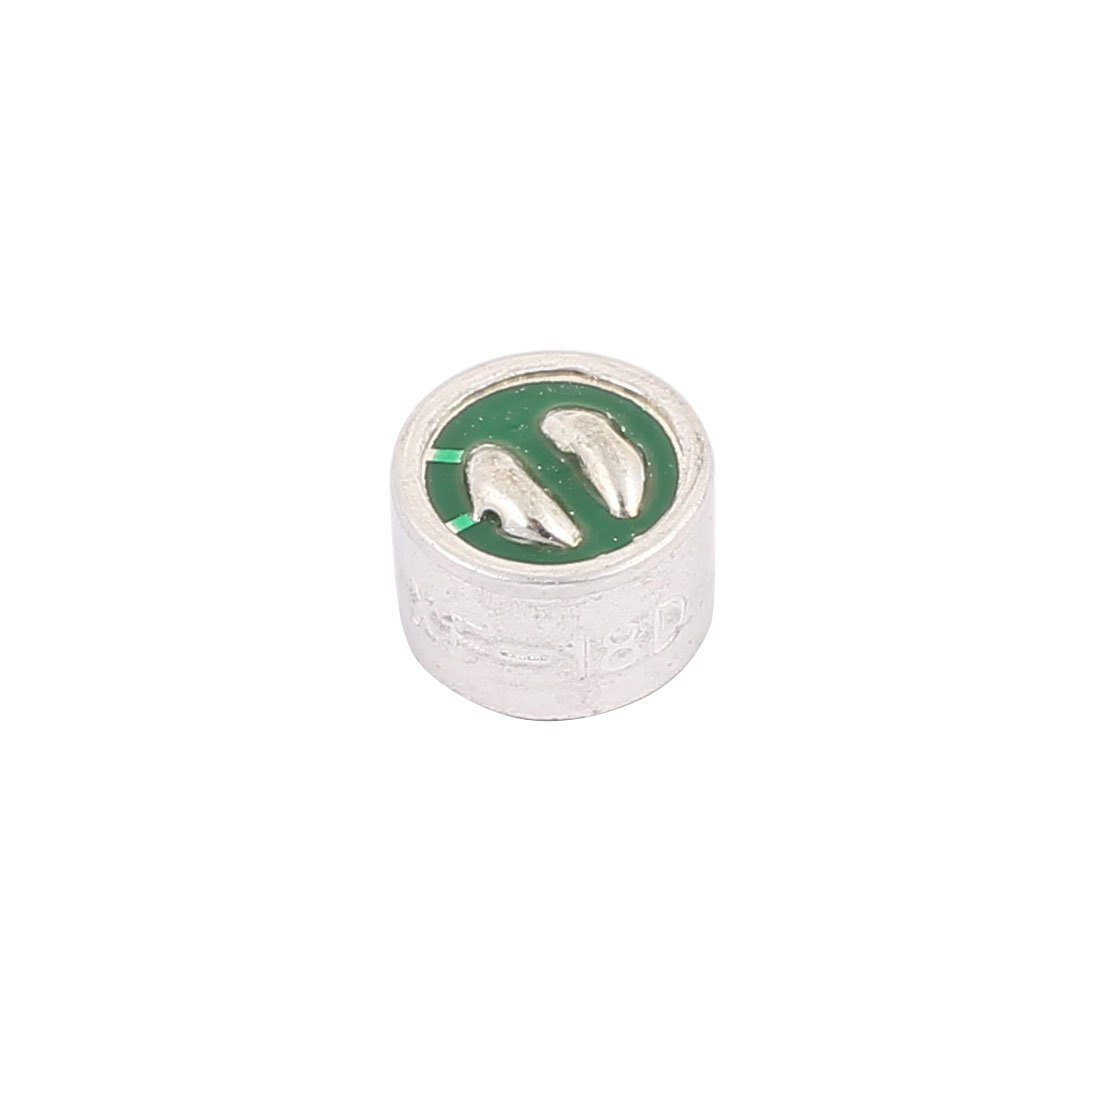 Amazon.com: eDealMax 9,7 mm x 6,7 mm estéreo capacitiva micrófono condensador eléctrico de recogida: Electronics